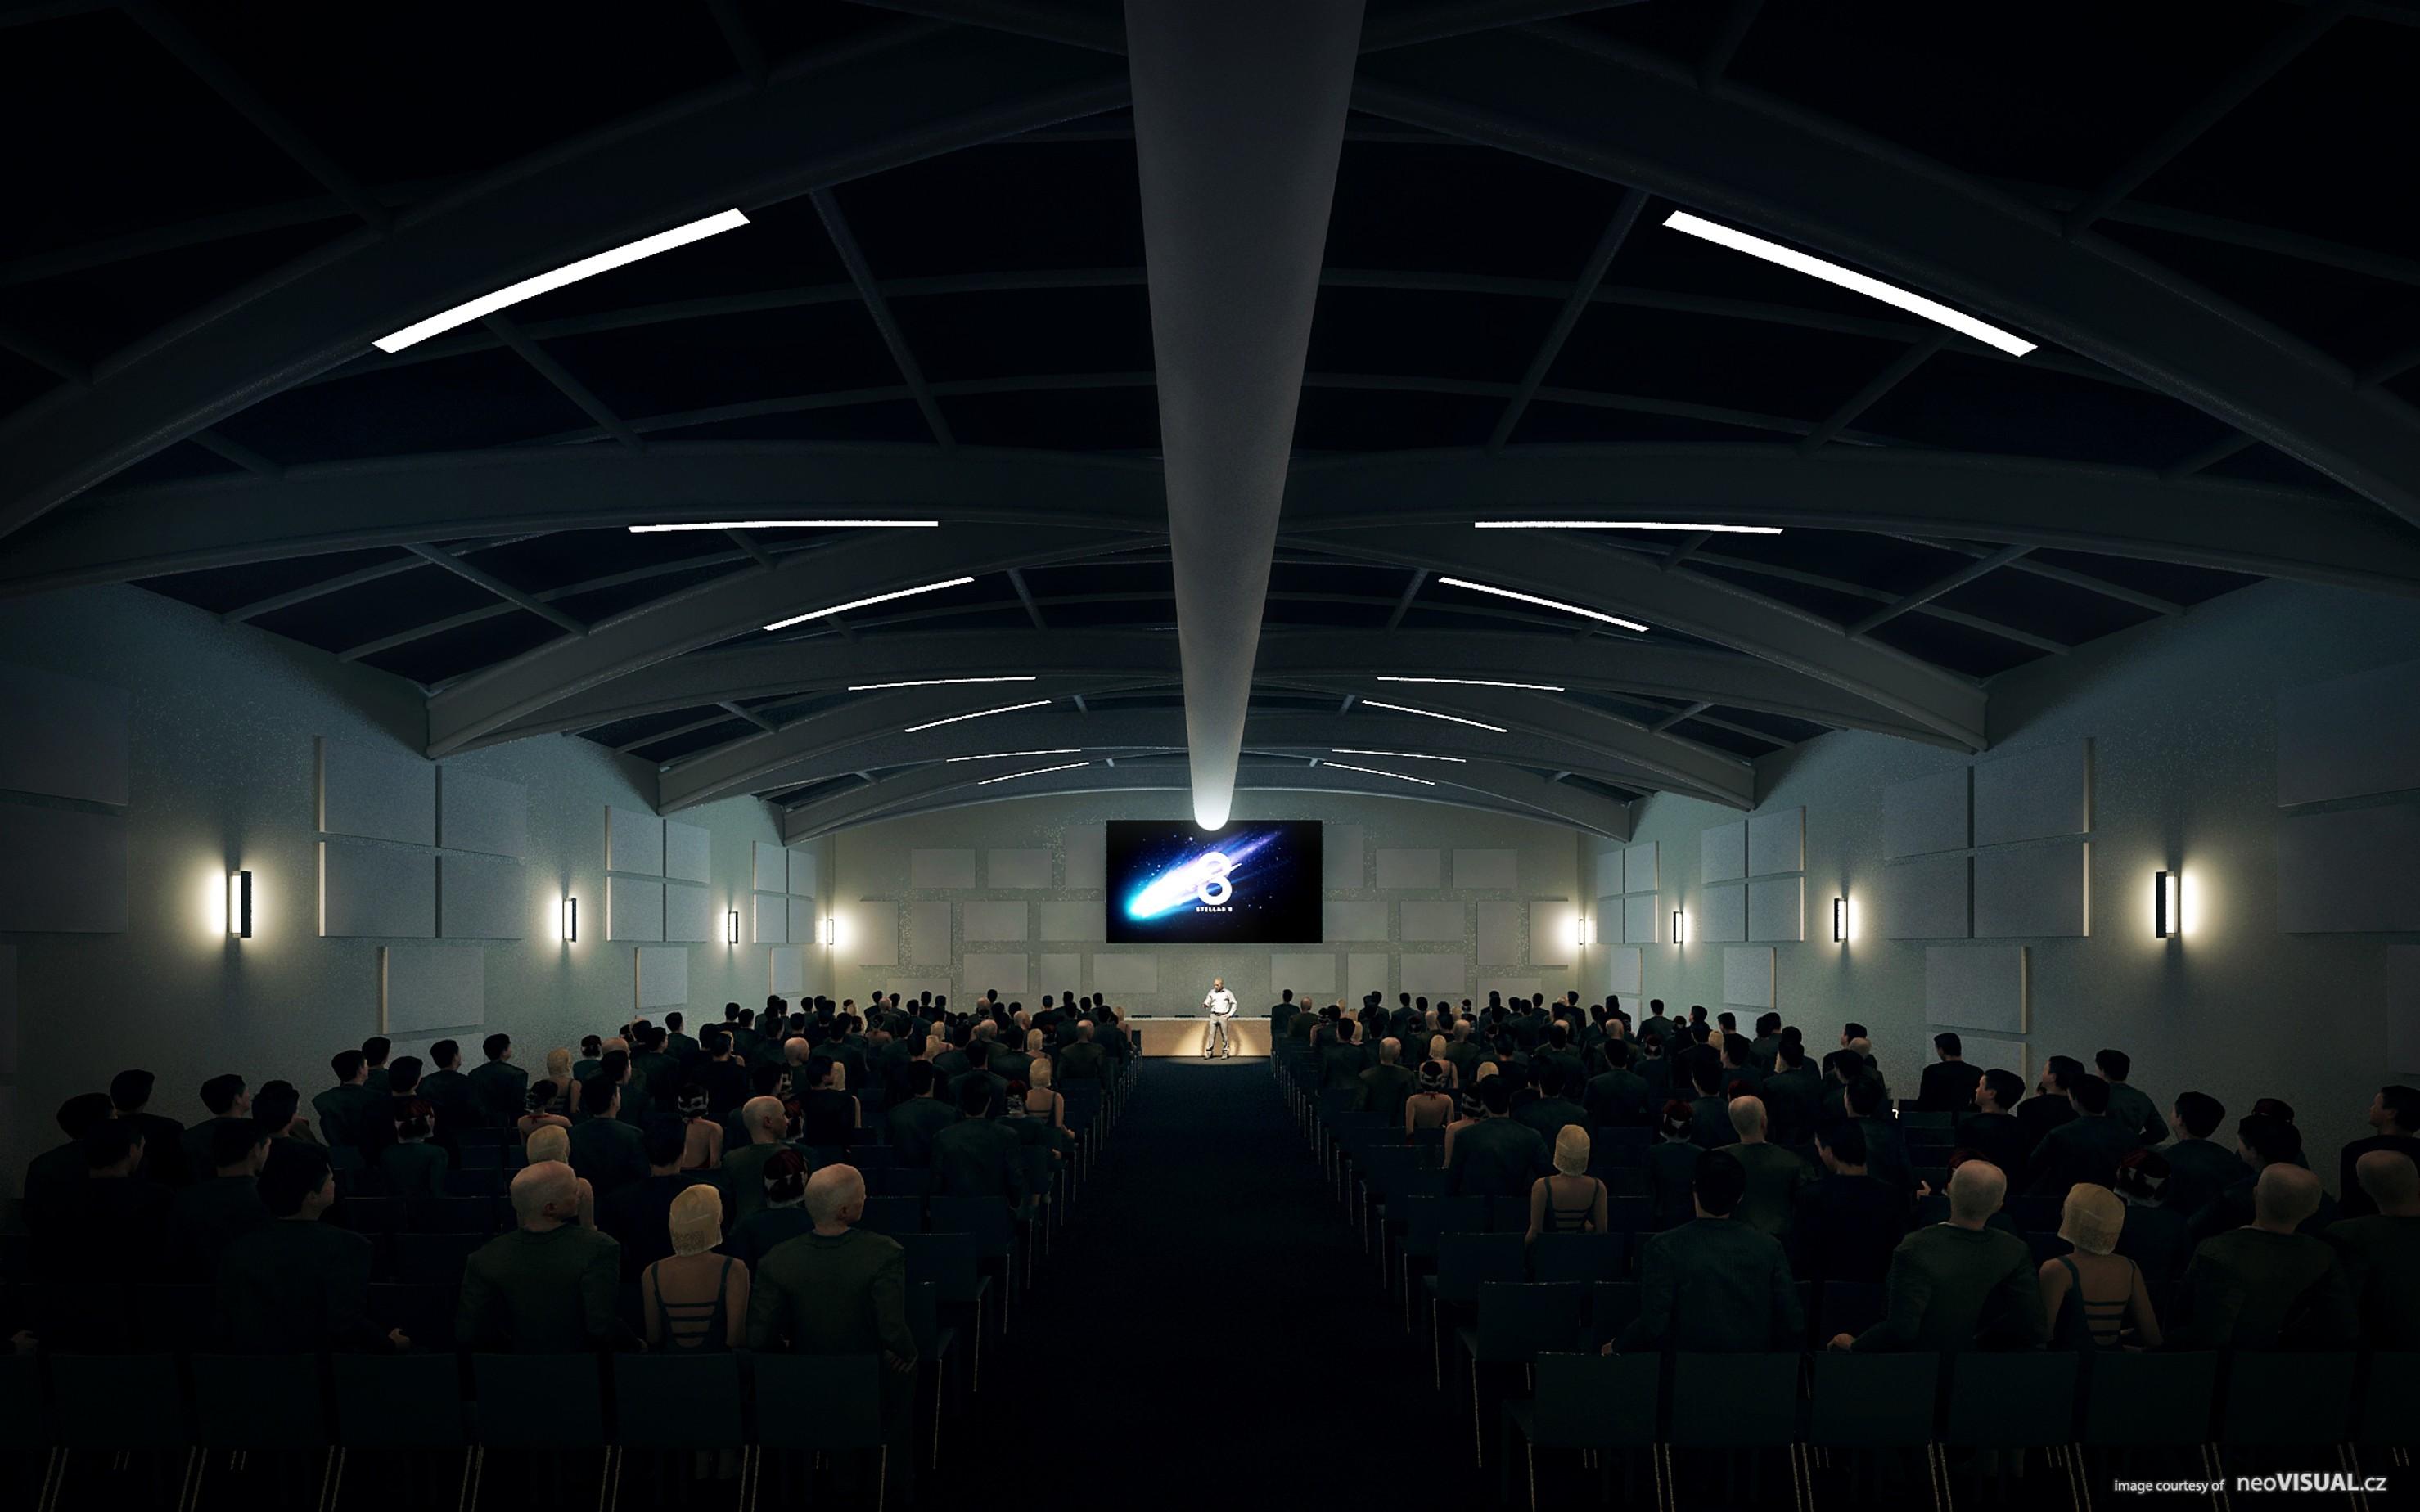 02Praha - O2 arena - Kongresová aréna